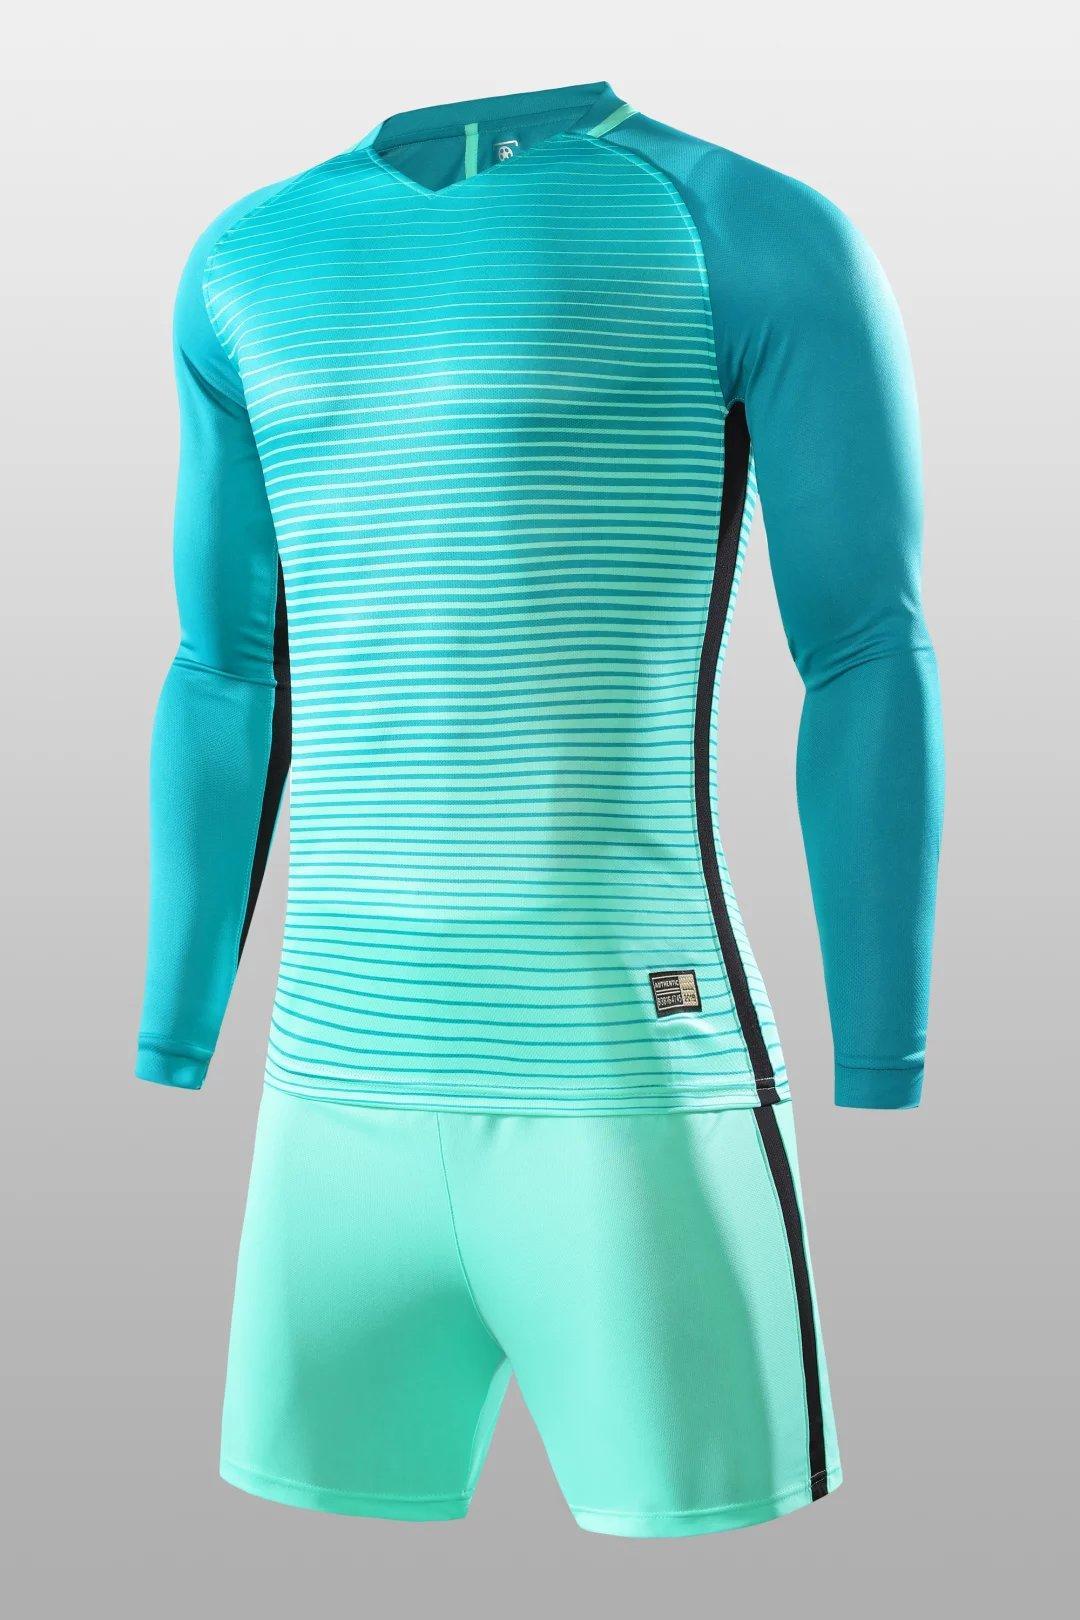 fb777b2b2fc Wholesale Custom Various Long Sleeve Soccer Jerseys Sets